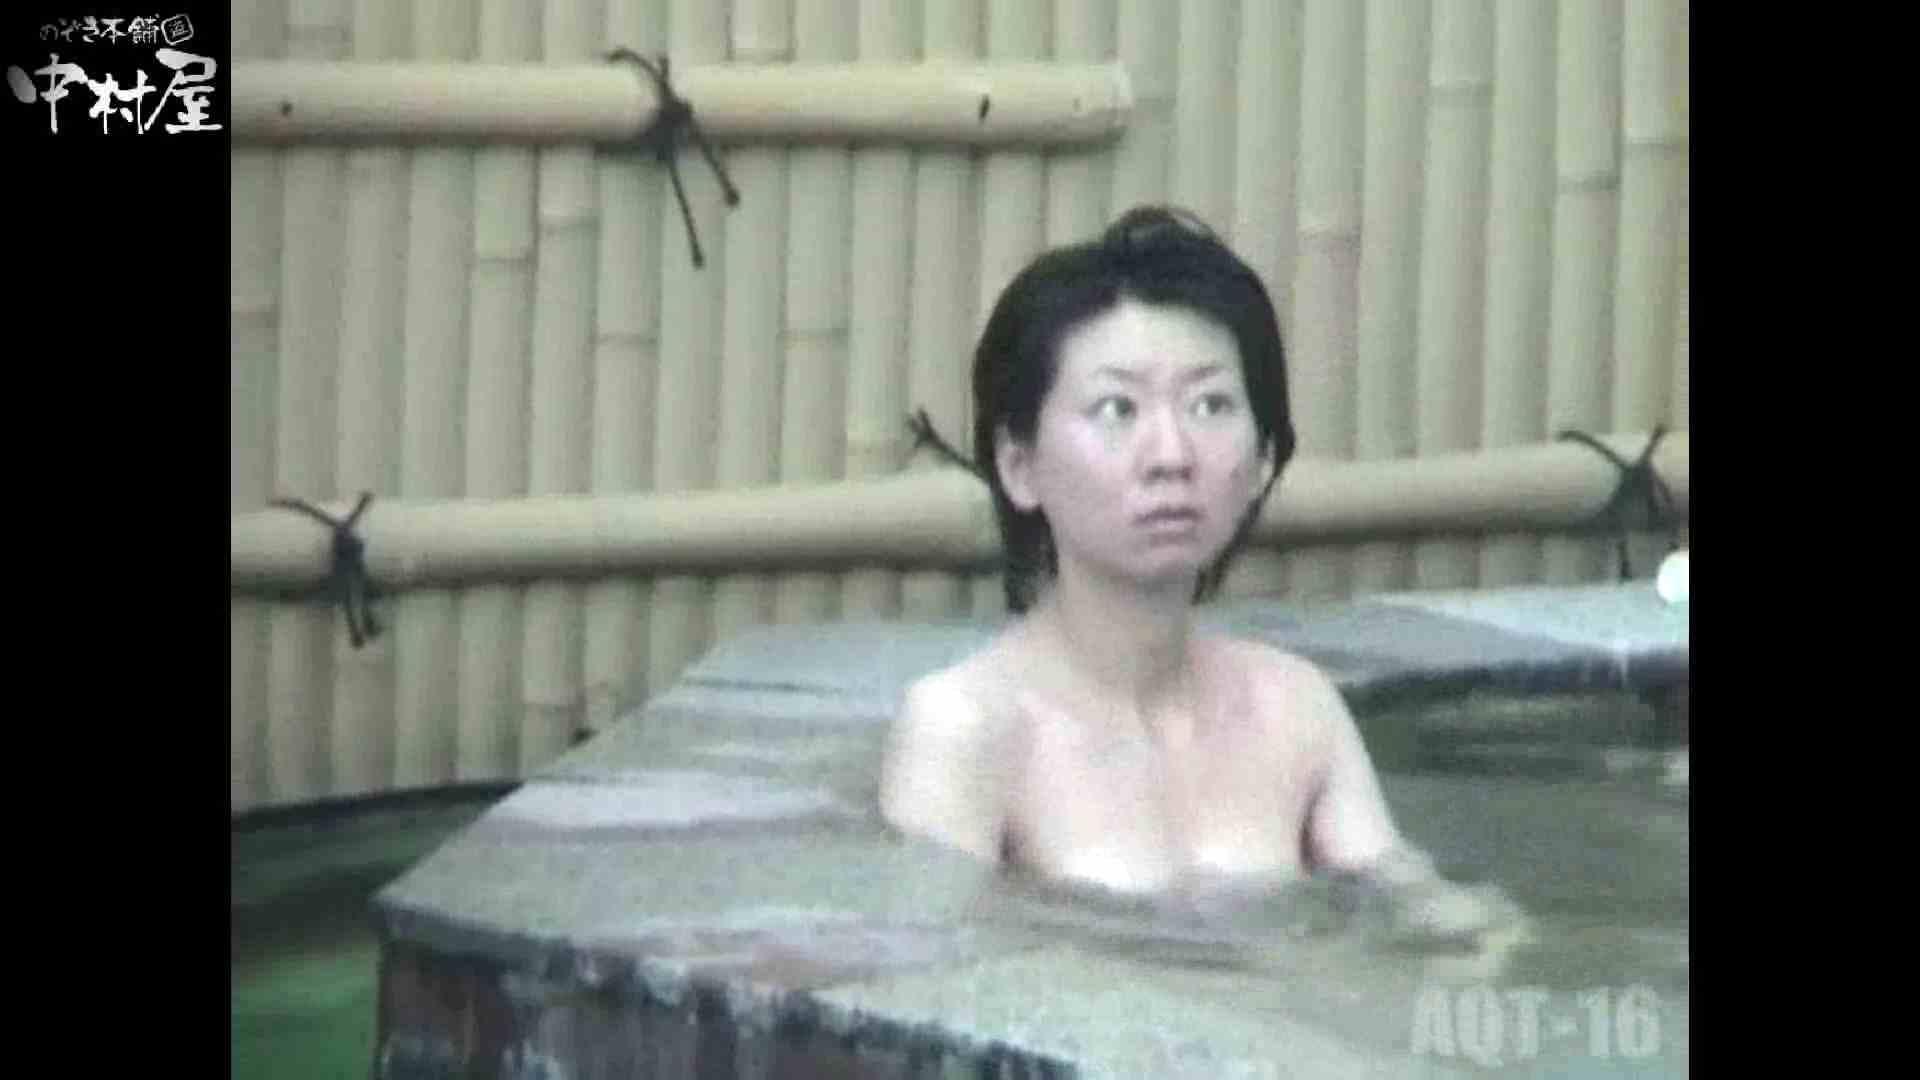 Aquaな露天風呂Vol.880潜入盗撮露天風呂十六判湯 其の三 盗撮師作品 | 美しいOLの裸体  100pic 65